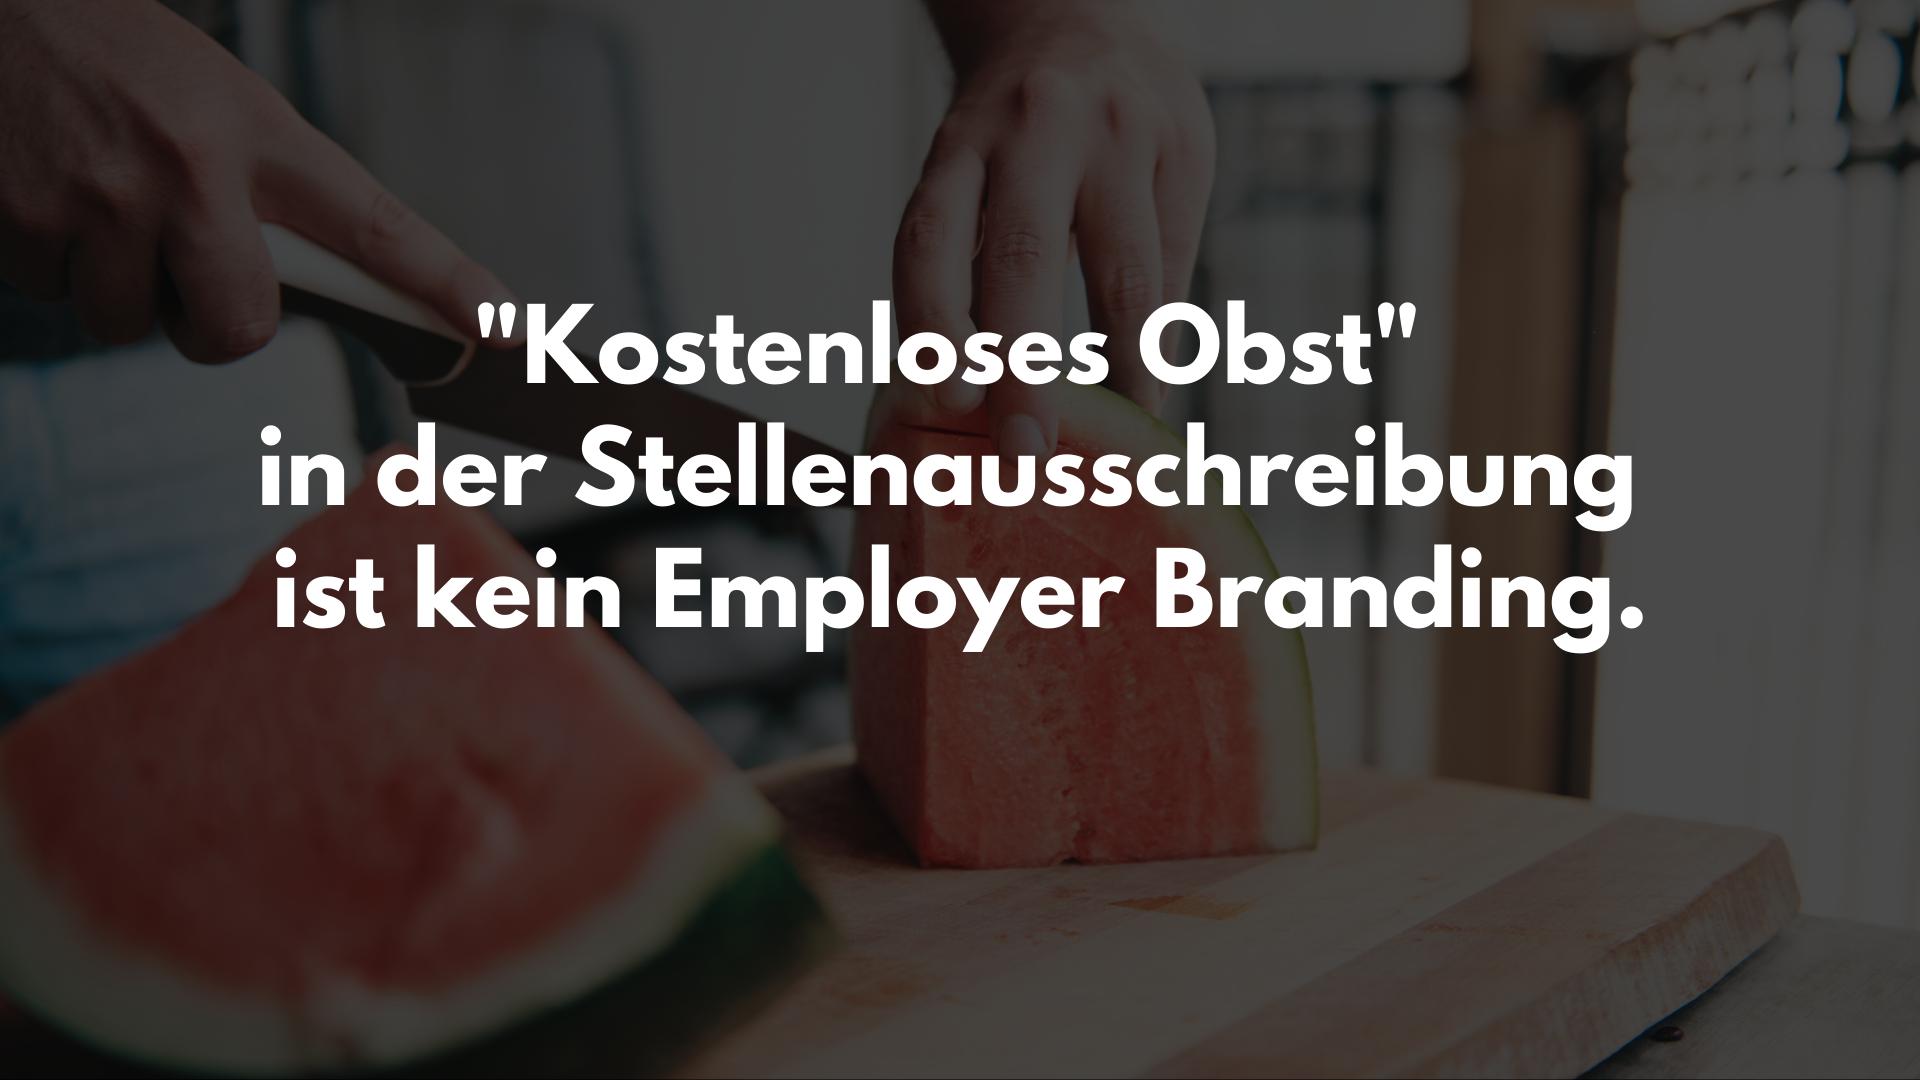 Employer Branding 2020 1